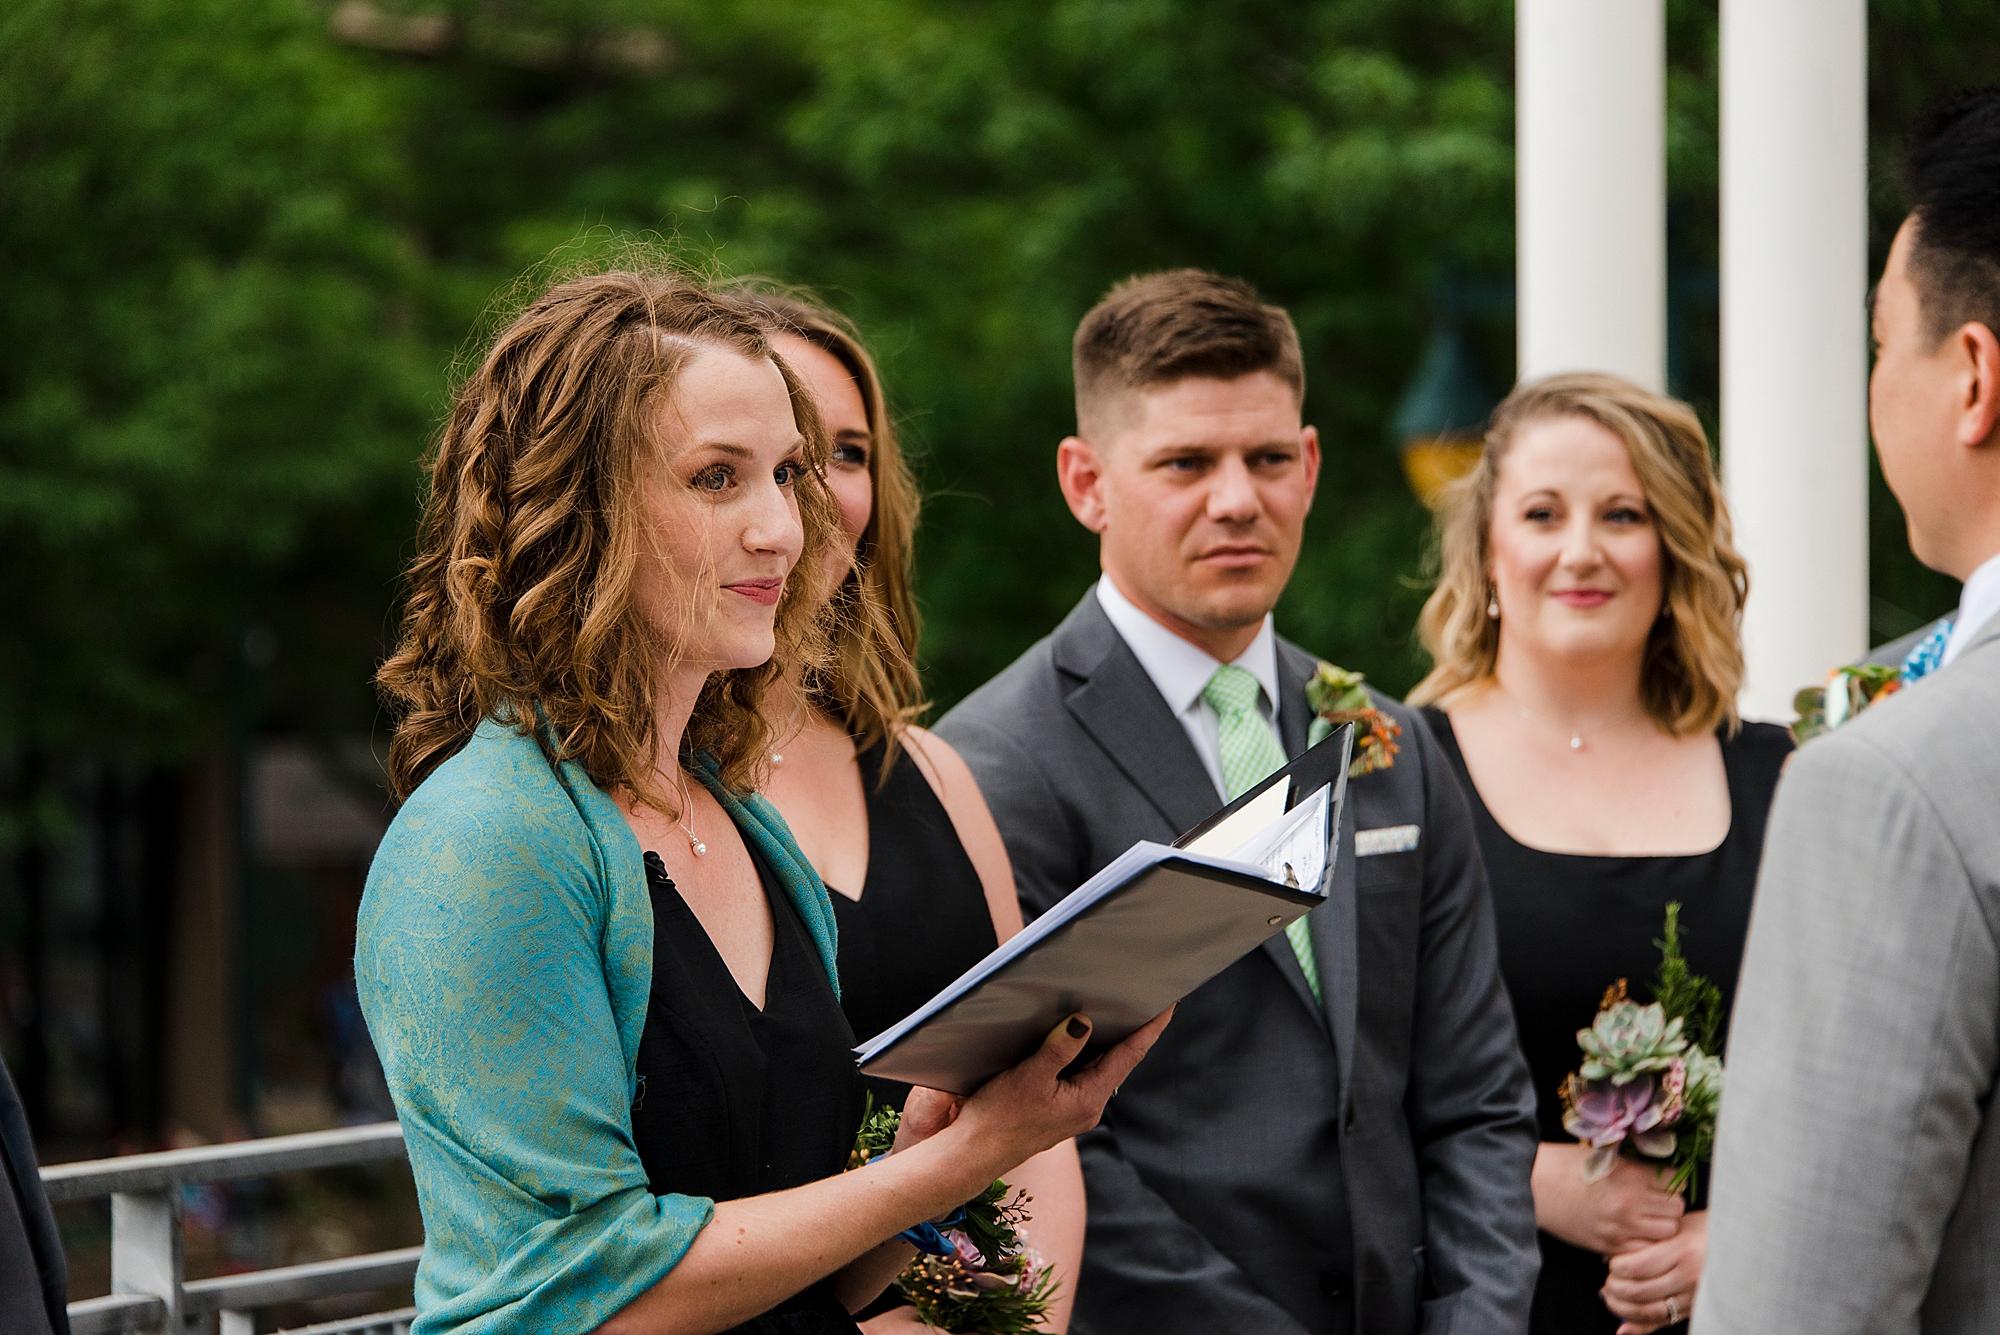 Dan_and_Byron_Love_by_Joe_Mac_Philadelphia_Wedding_LGBTQ_Photography_Gay_Independence_visitor_Center_82.JPG